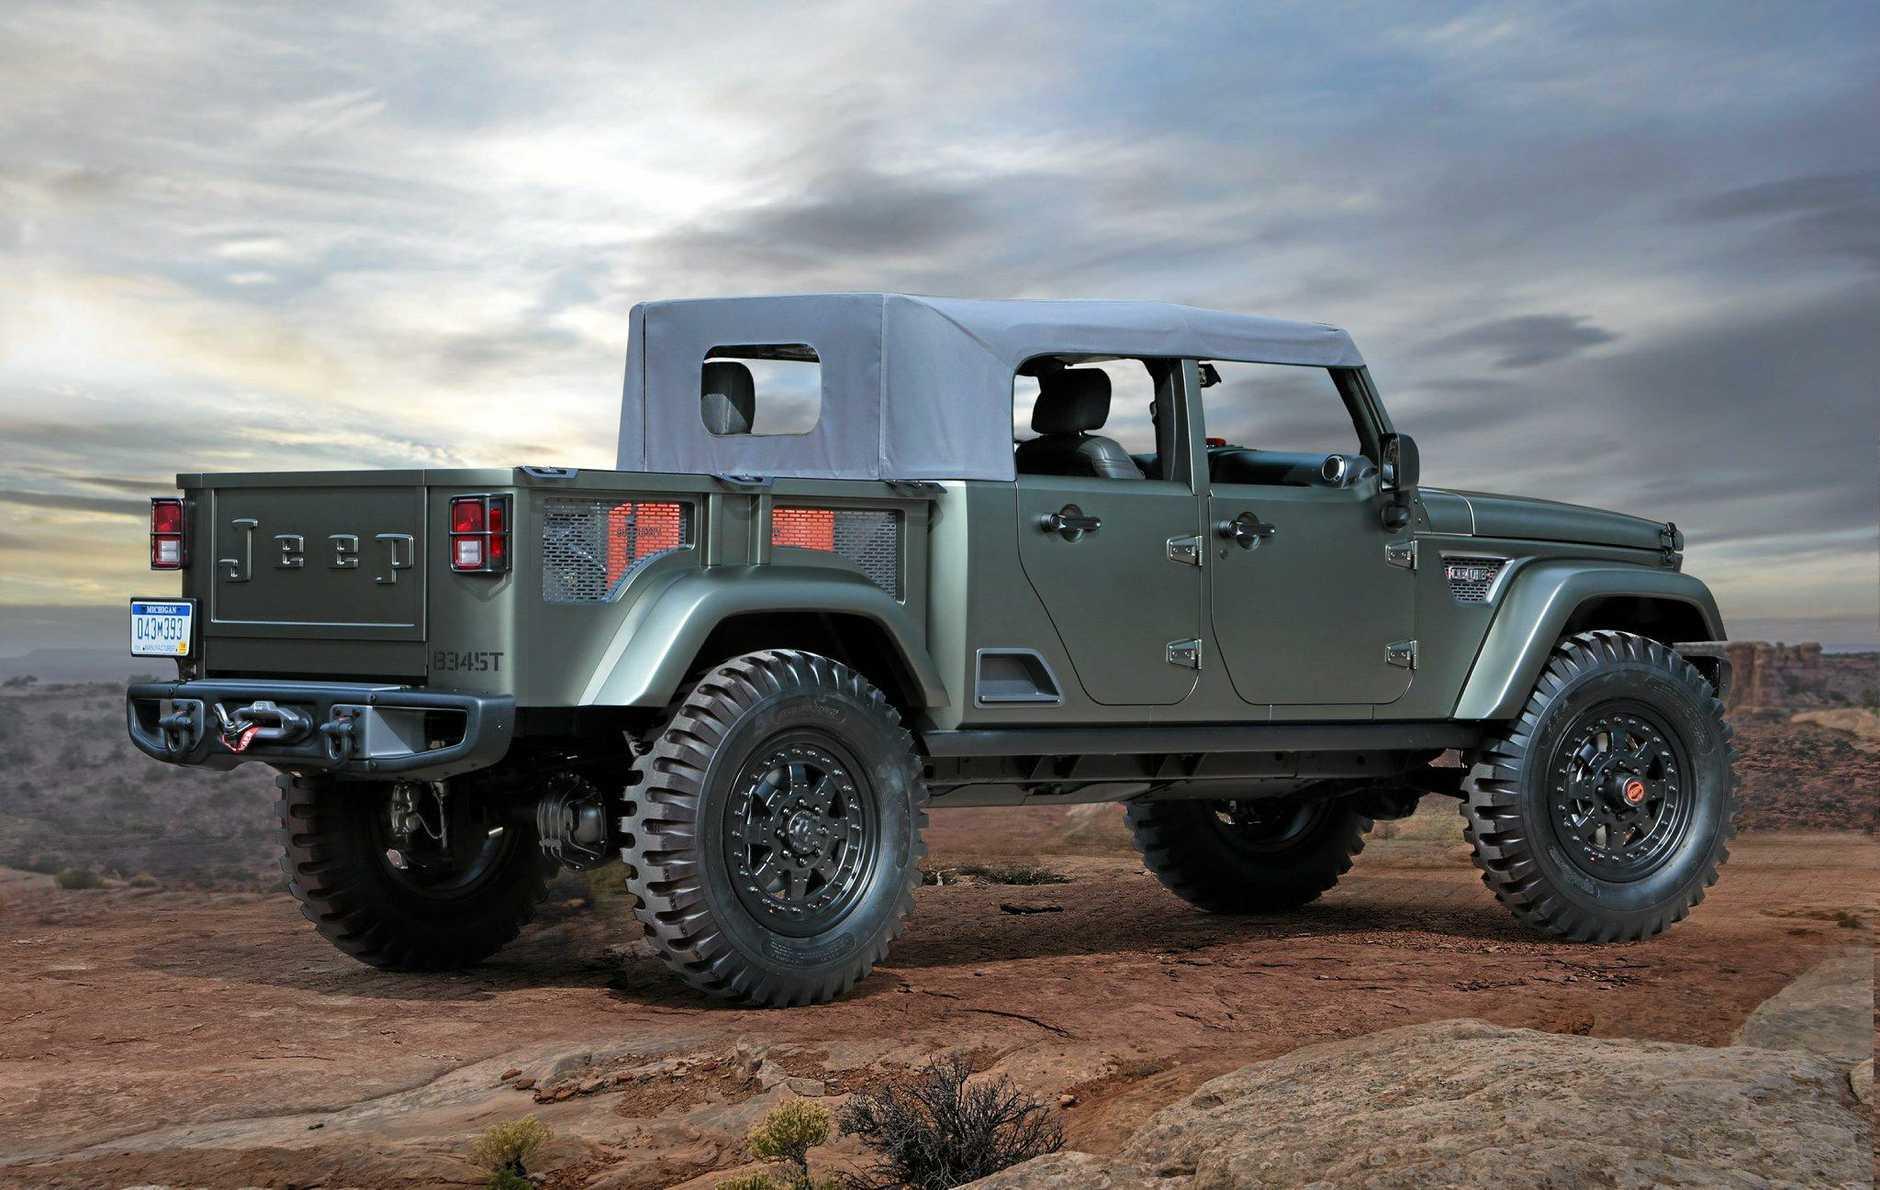 JeepÆ Crew Chief 715 Concept